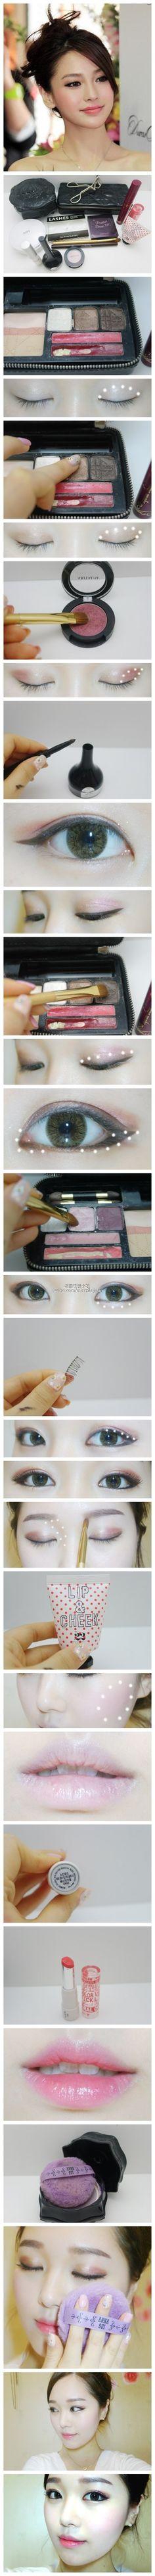 Korean make up http://hellomzkrystal.blogspot.com/